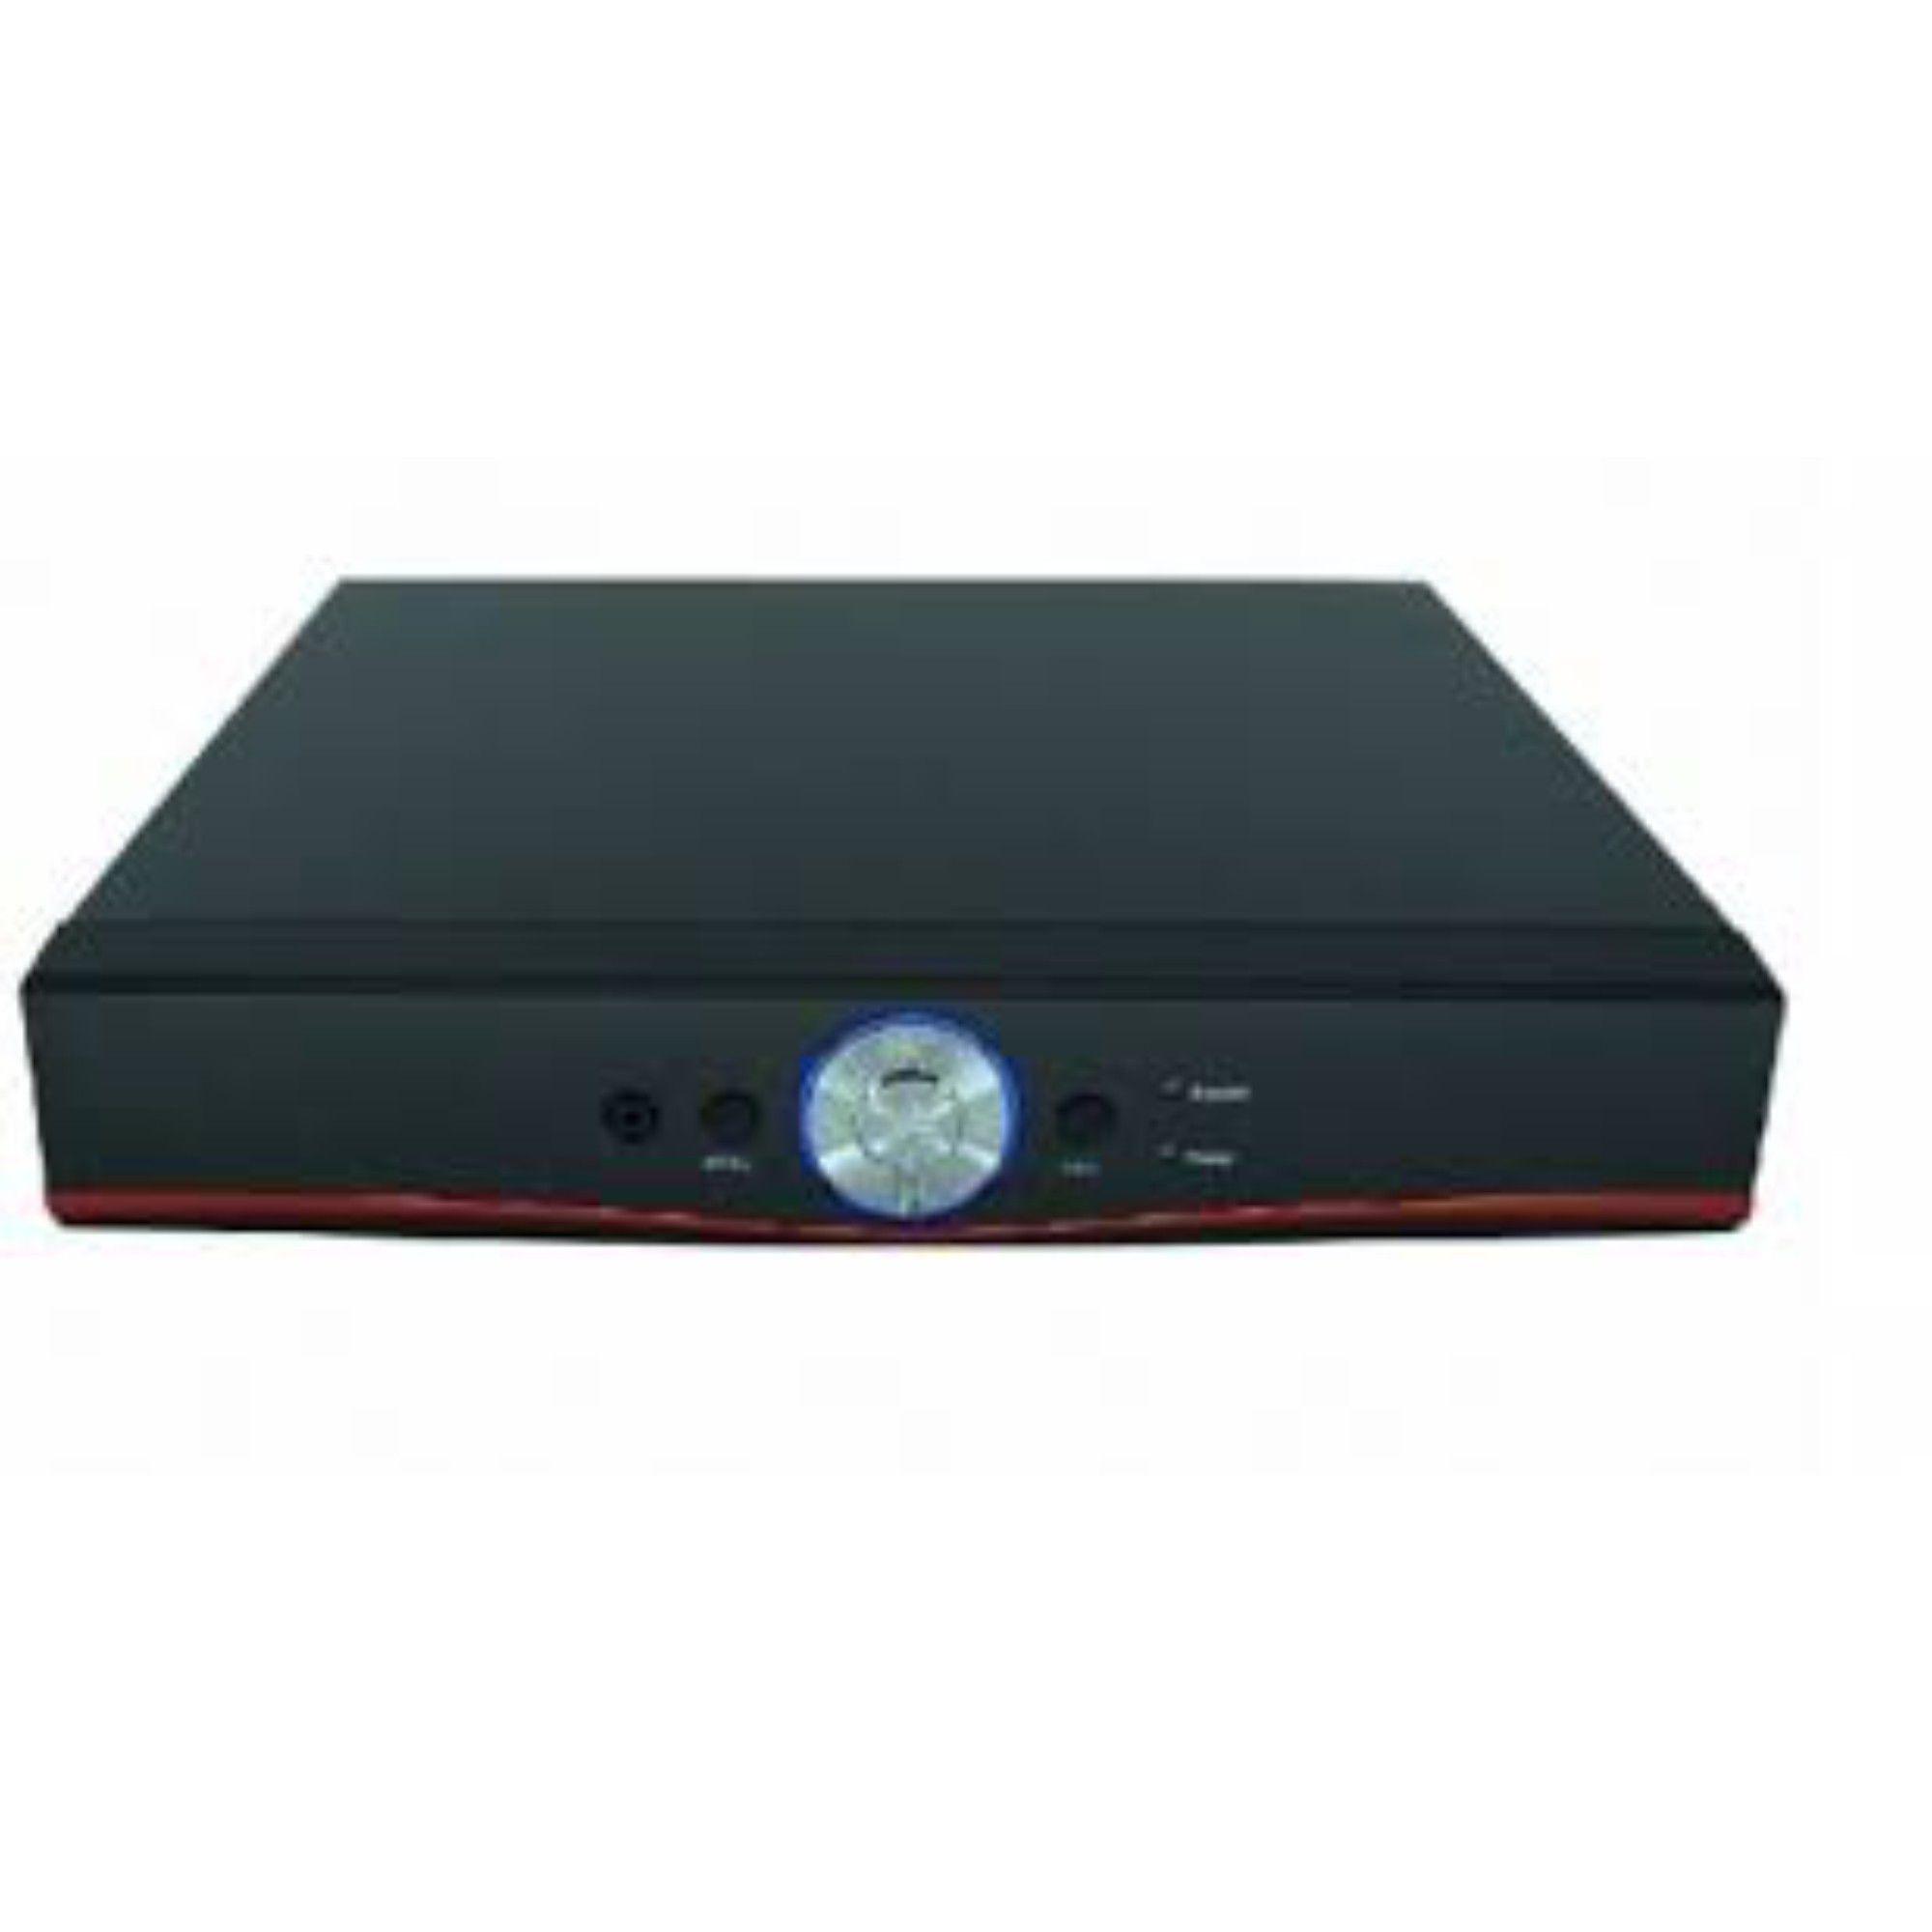 Kit CFTV Jortan Completo 16 Câmeras AHD 720p DVR 16 Canais